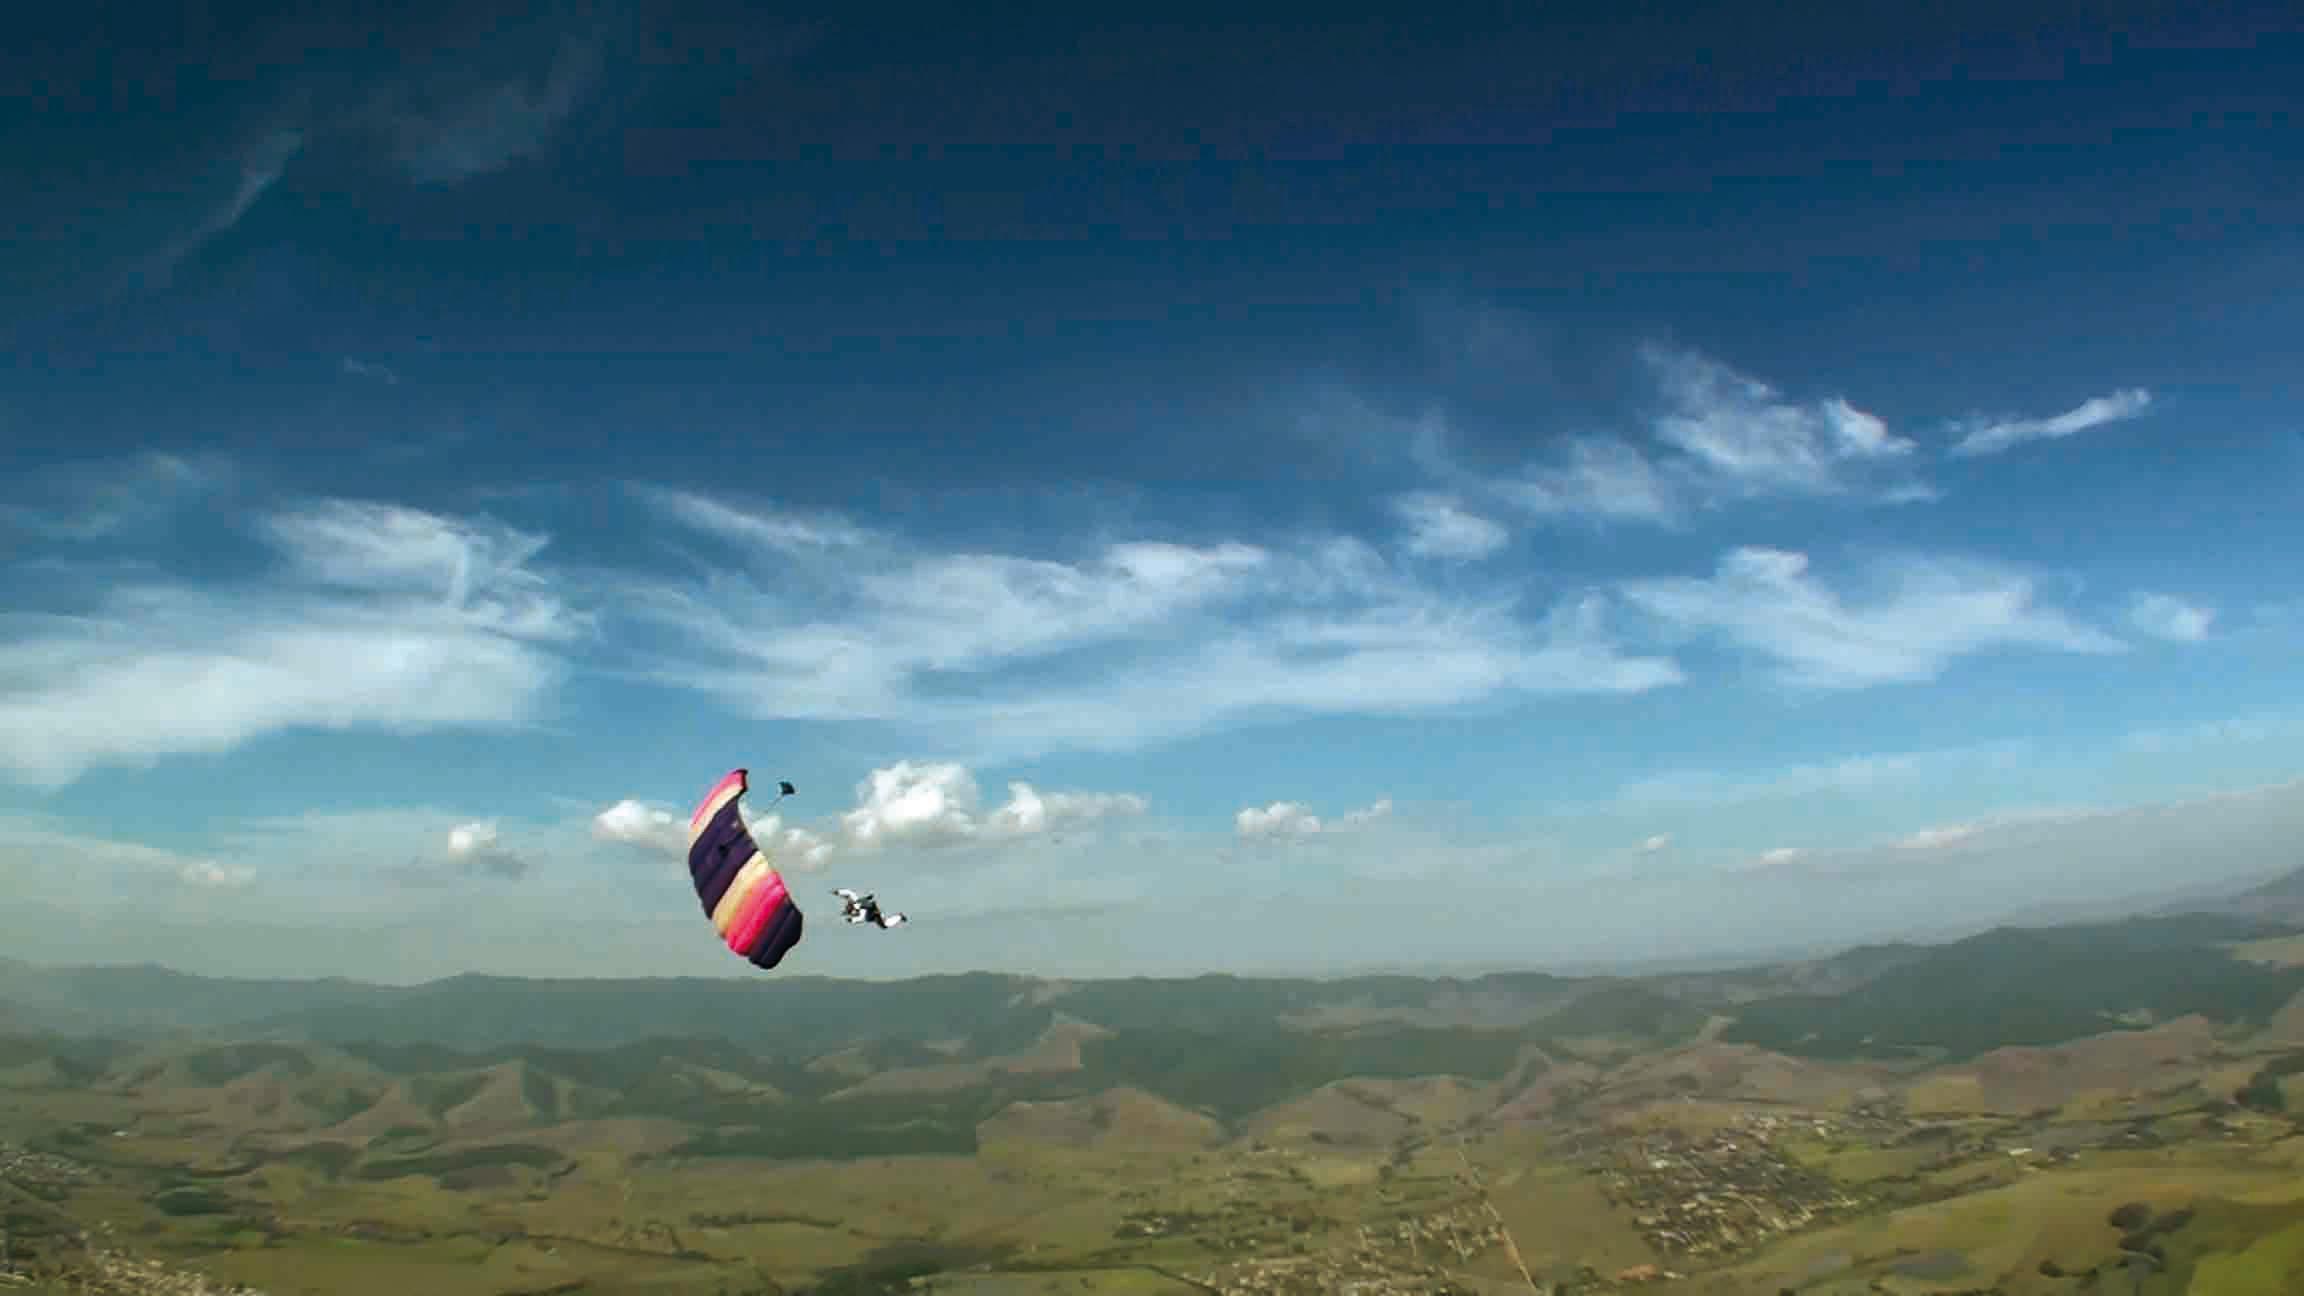 Pindamonhangaba-Esporte-Paraquedismo-Radicais-Livres-1-bx